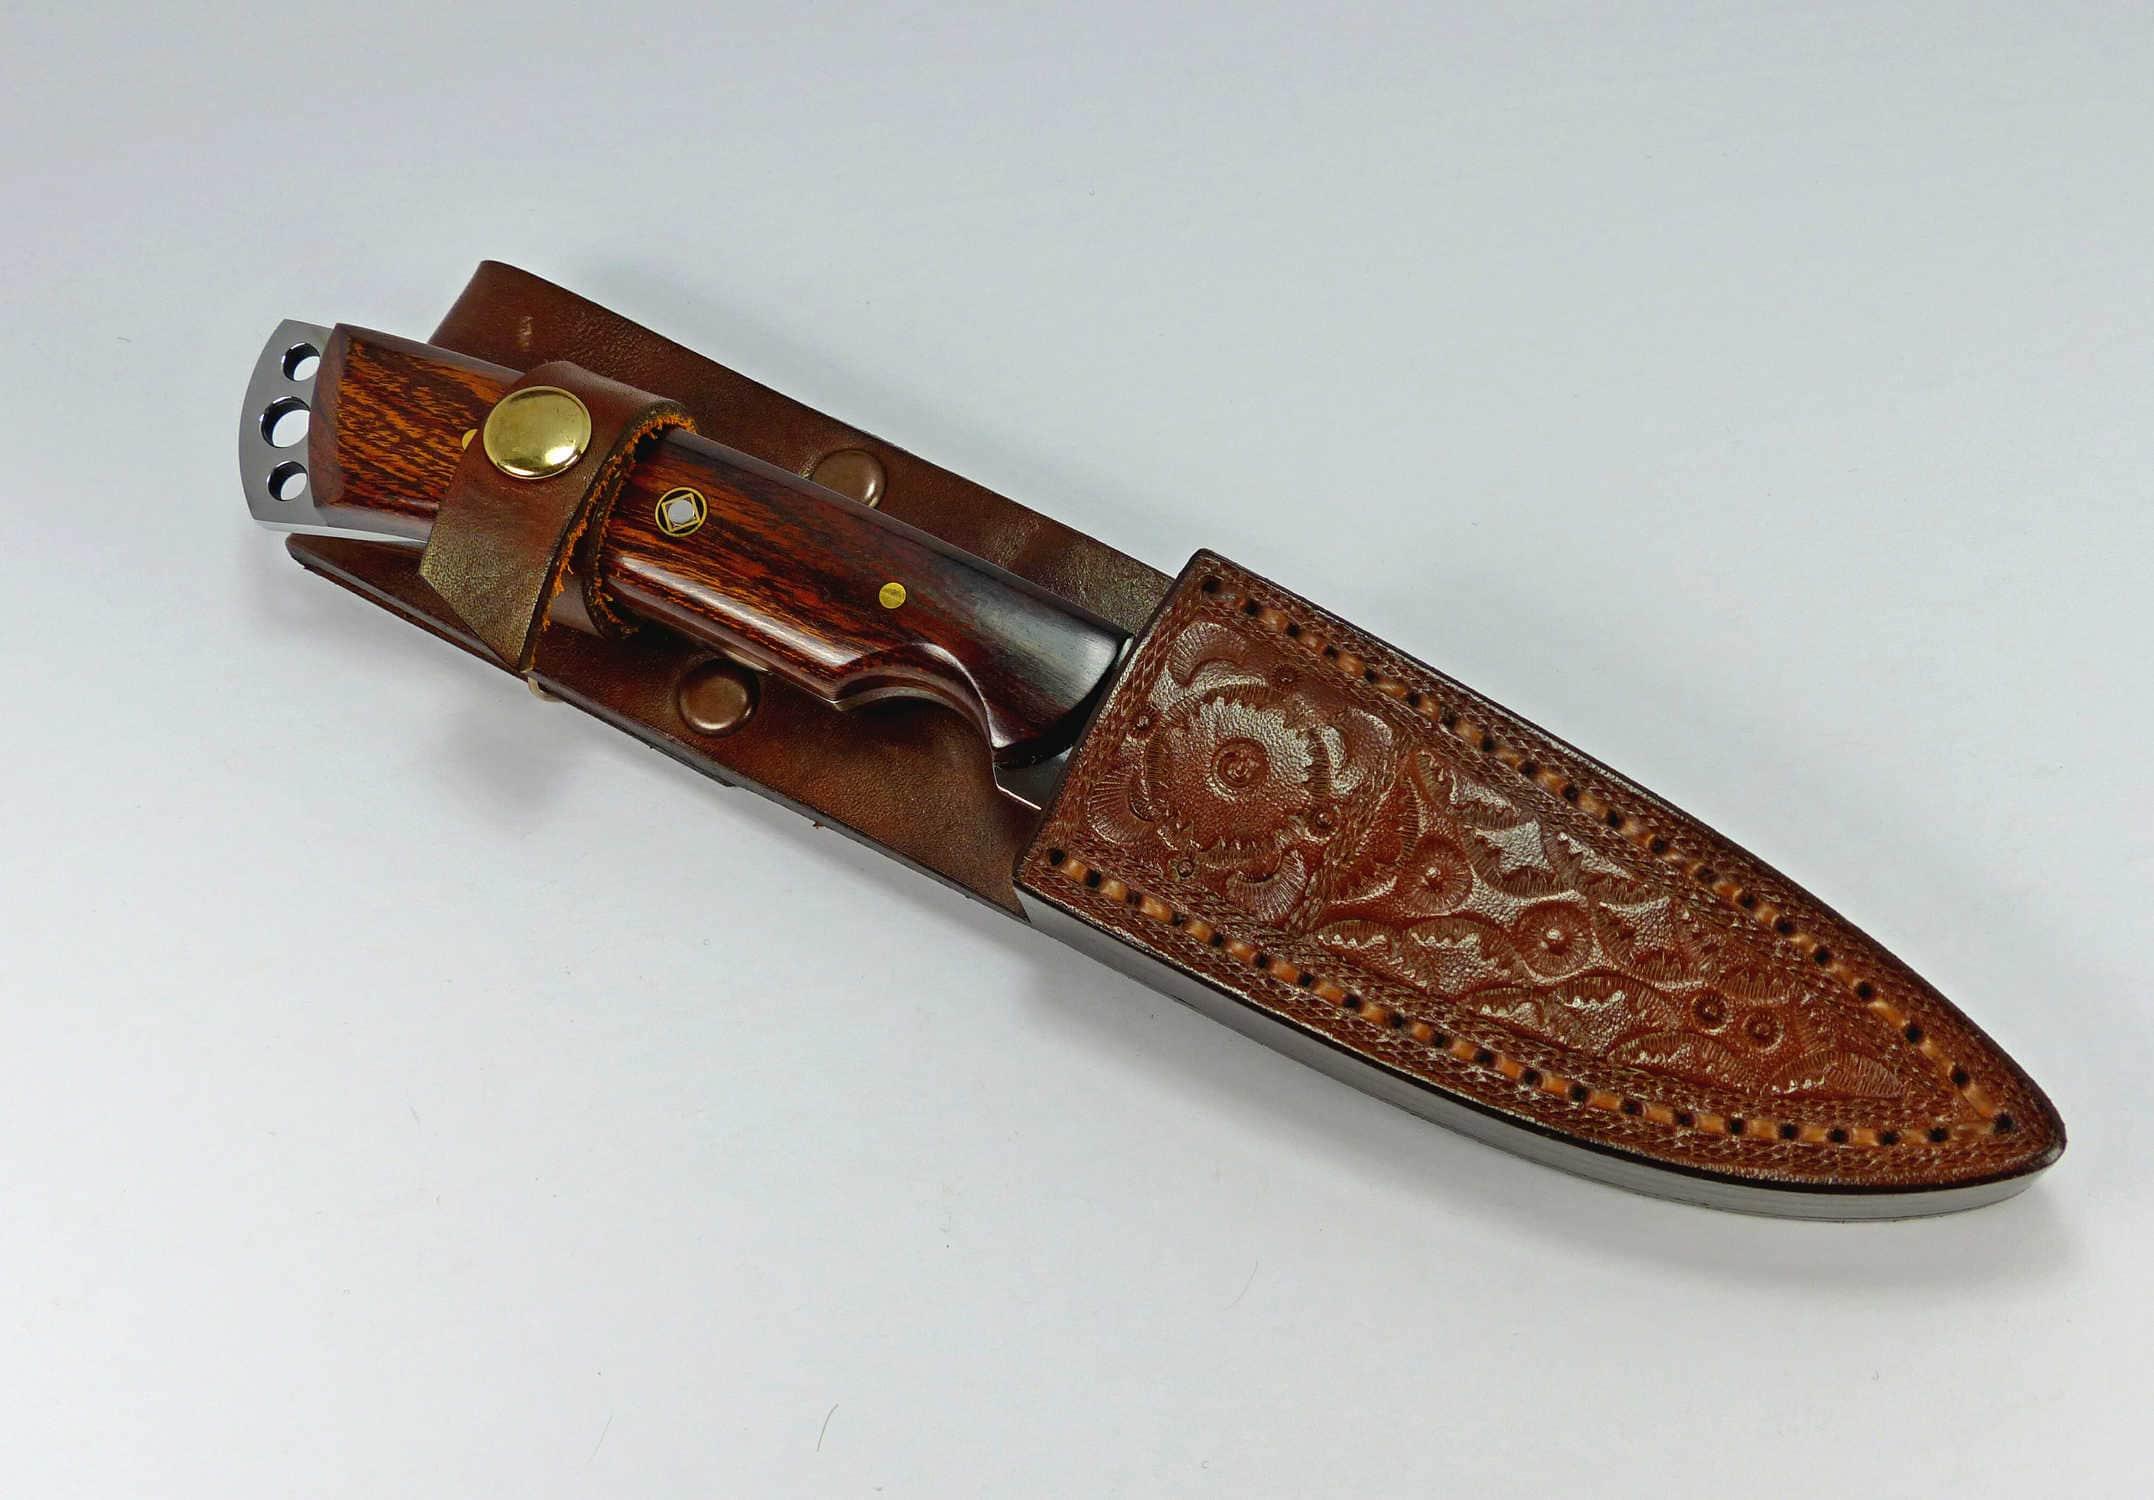 Fixed blade sportsman knife inside custom fitted brown leather sheath